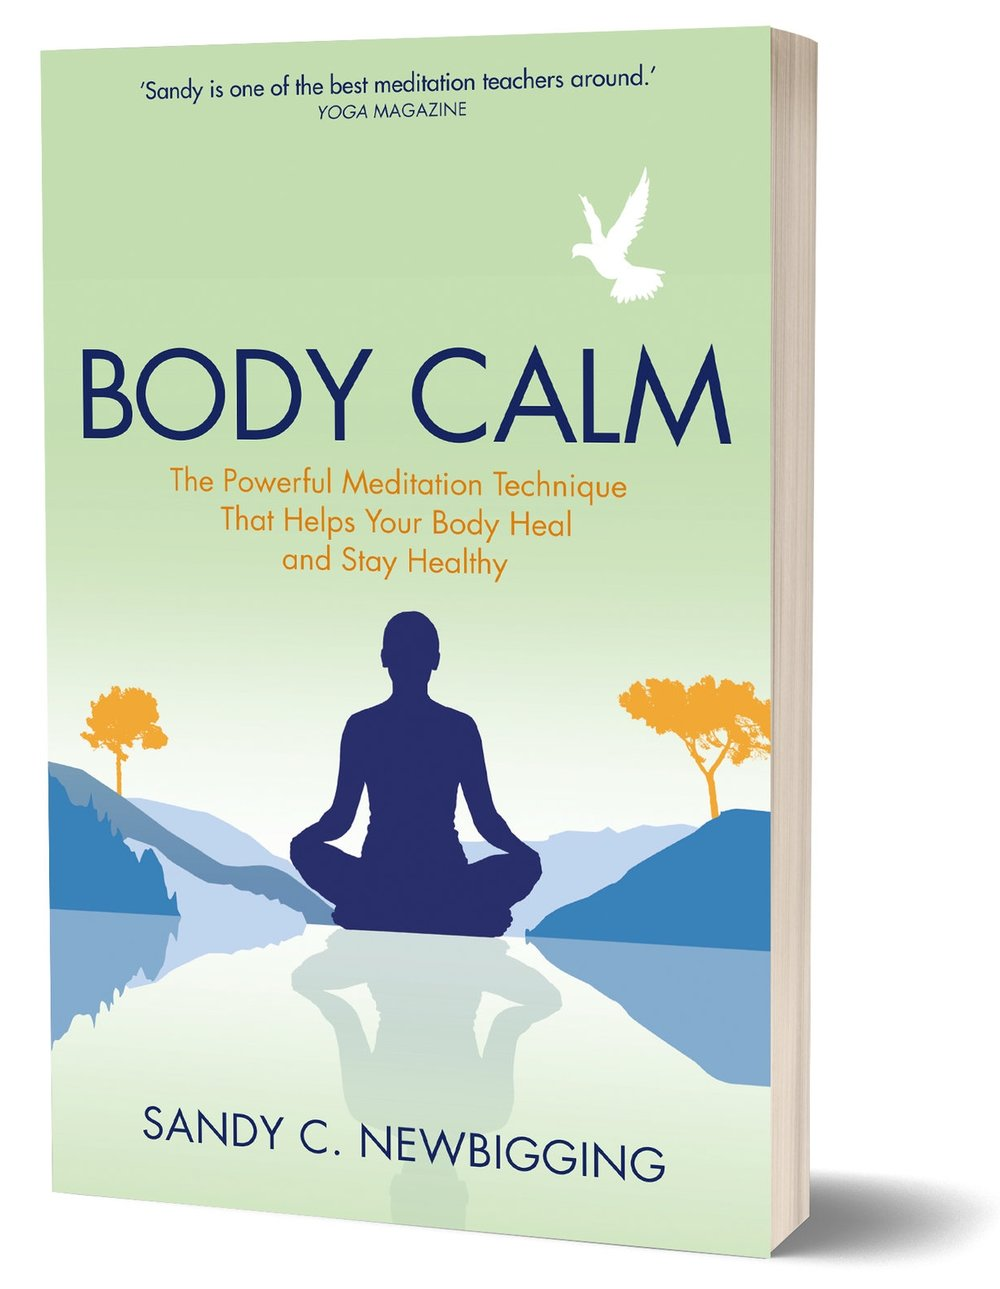 Body Calm Front pb.jpg